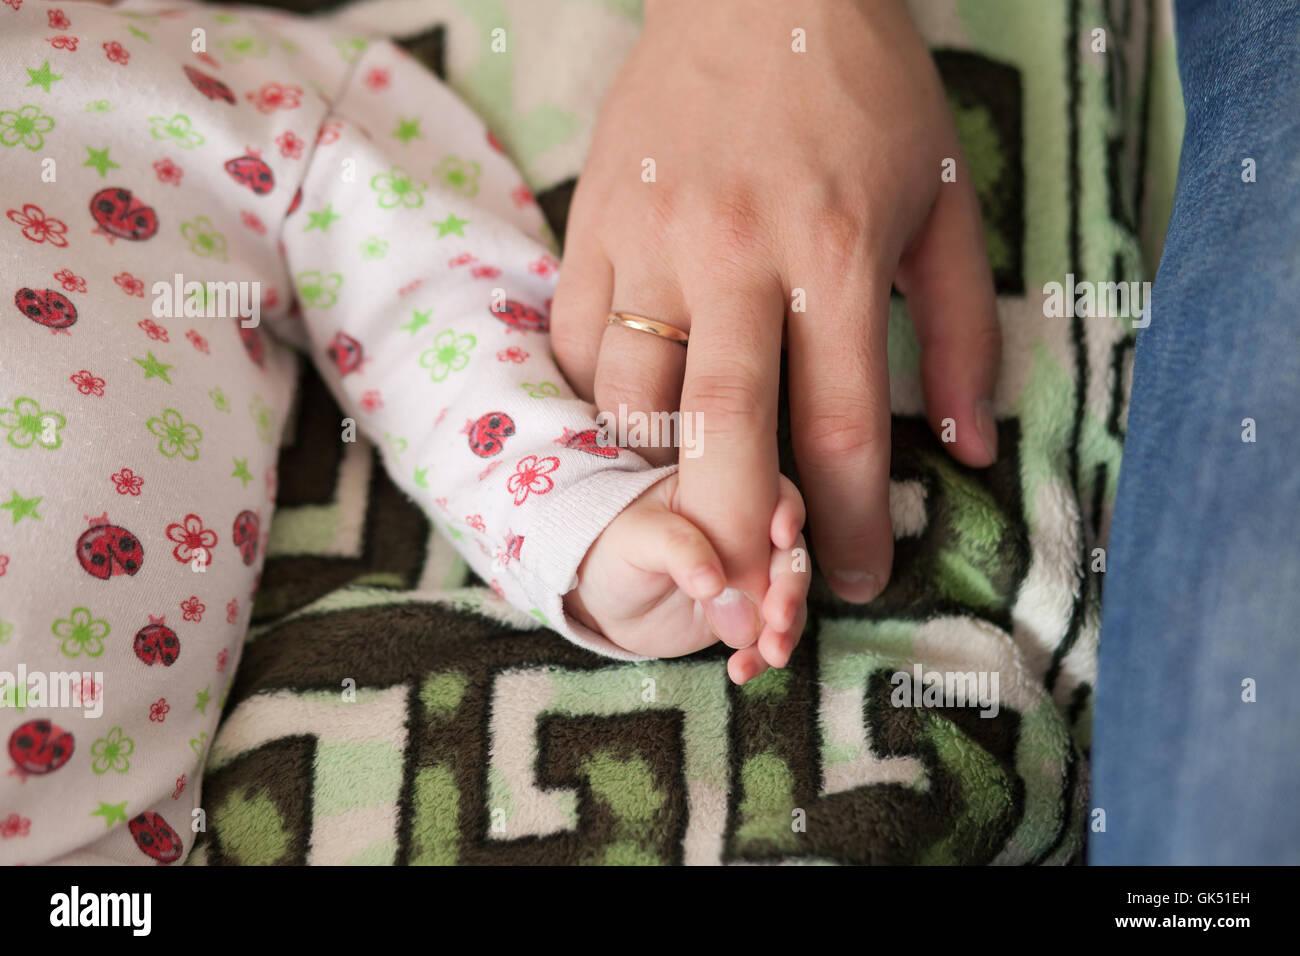 Sohn und Vater, Baby mit Papas Finger. Familienkonzept Stockfoto